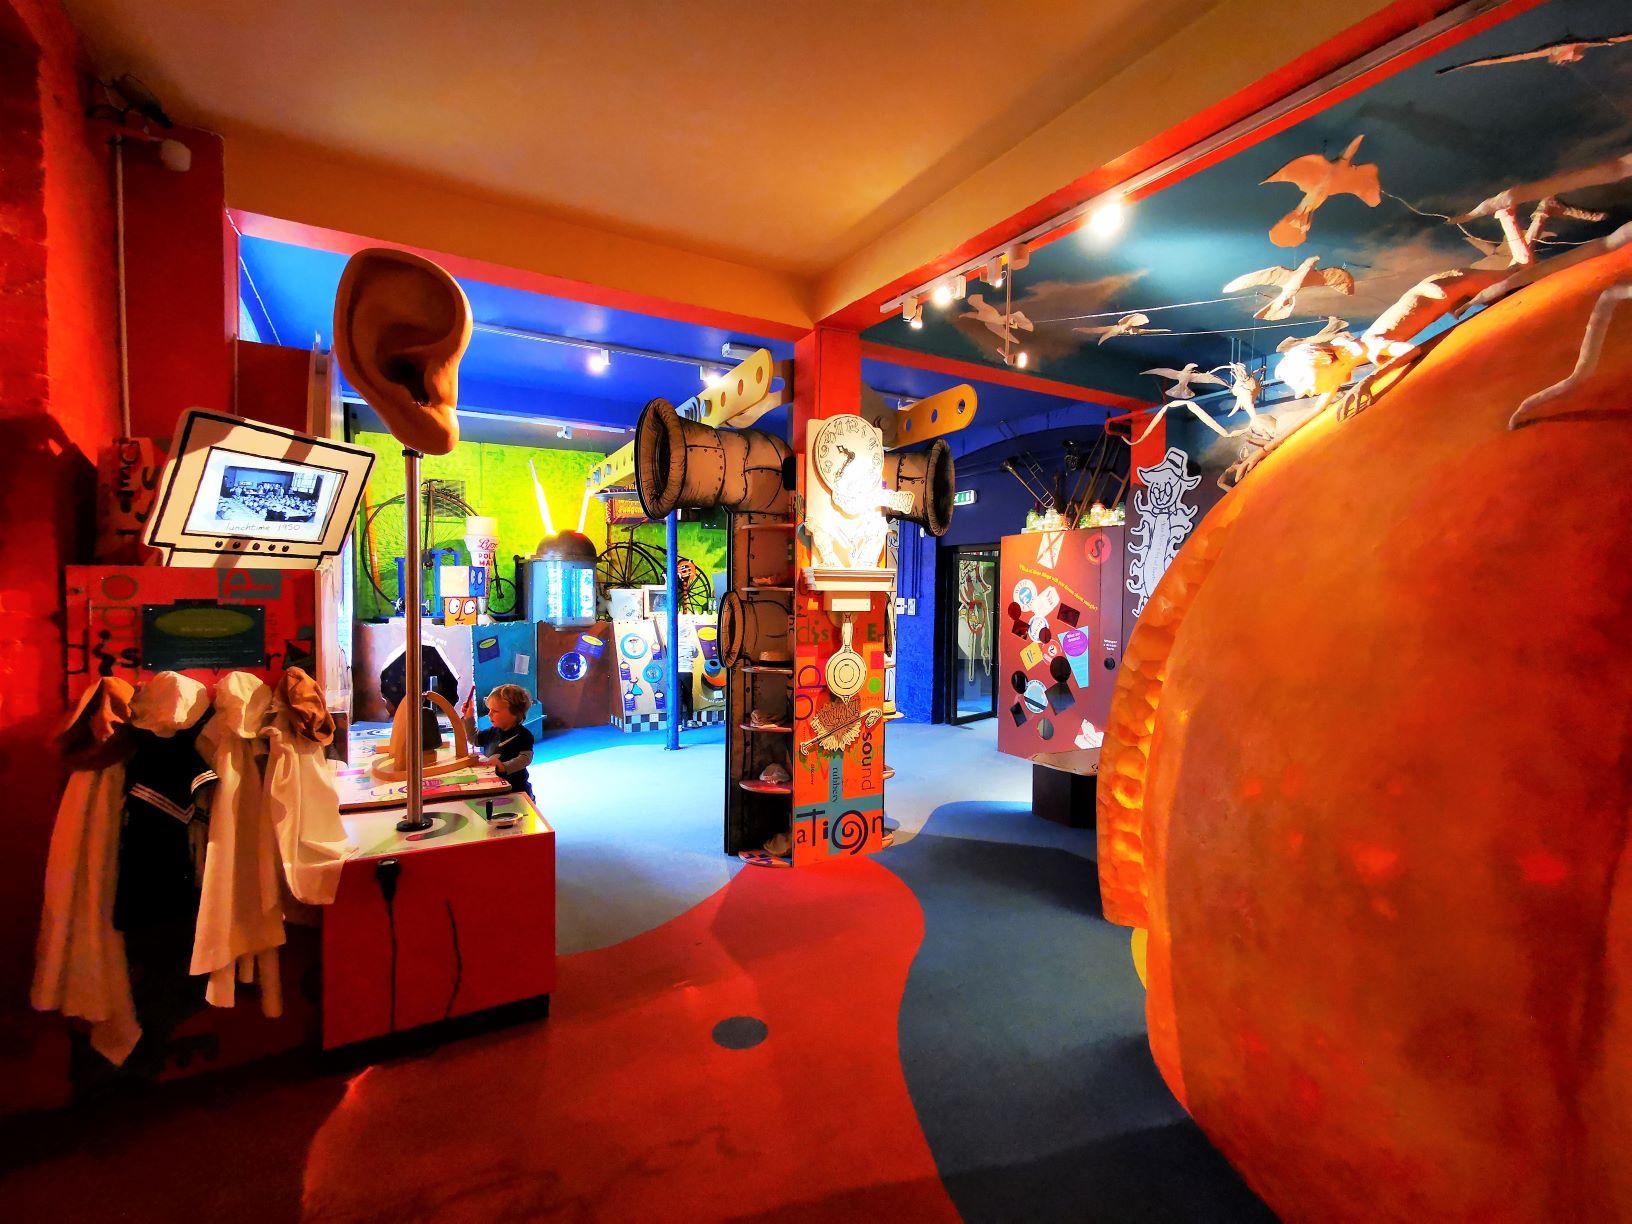 The Roald Dahl childrens gallery